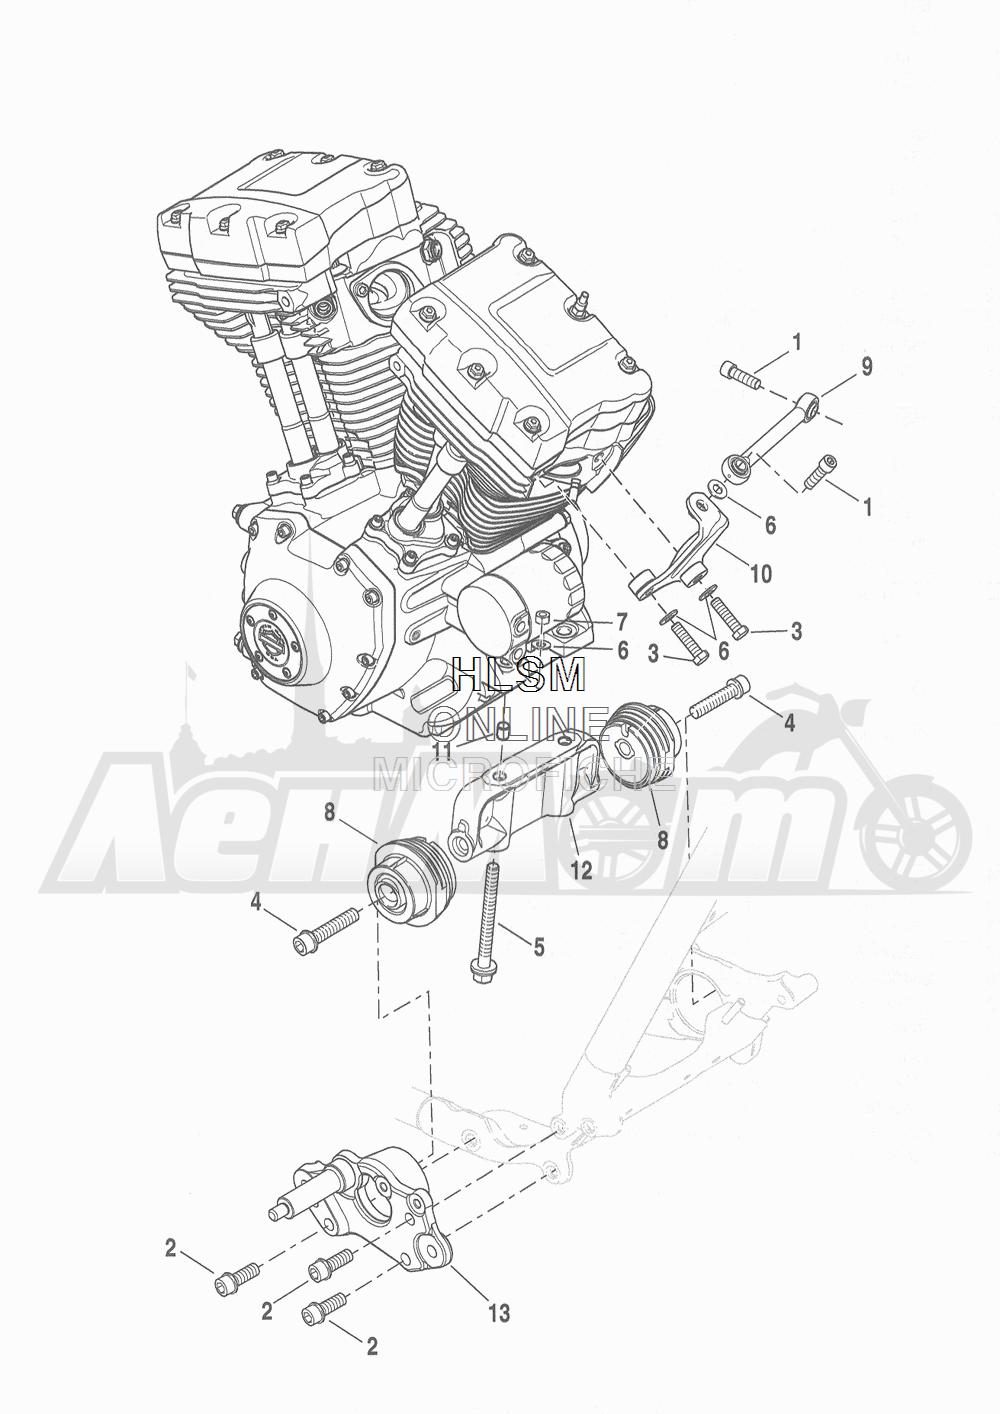 Запчасти для Мотоцикла Harley-Davidson 2016 FLHRC ROAD KING CLASSIC (FRM) Раздел: ENGINE MOUNTS W/ STABILIZER LINK   опоры двигателя вместе с стабилизатор